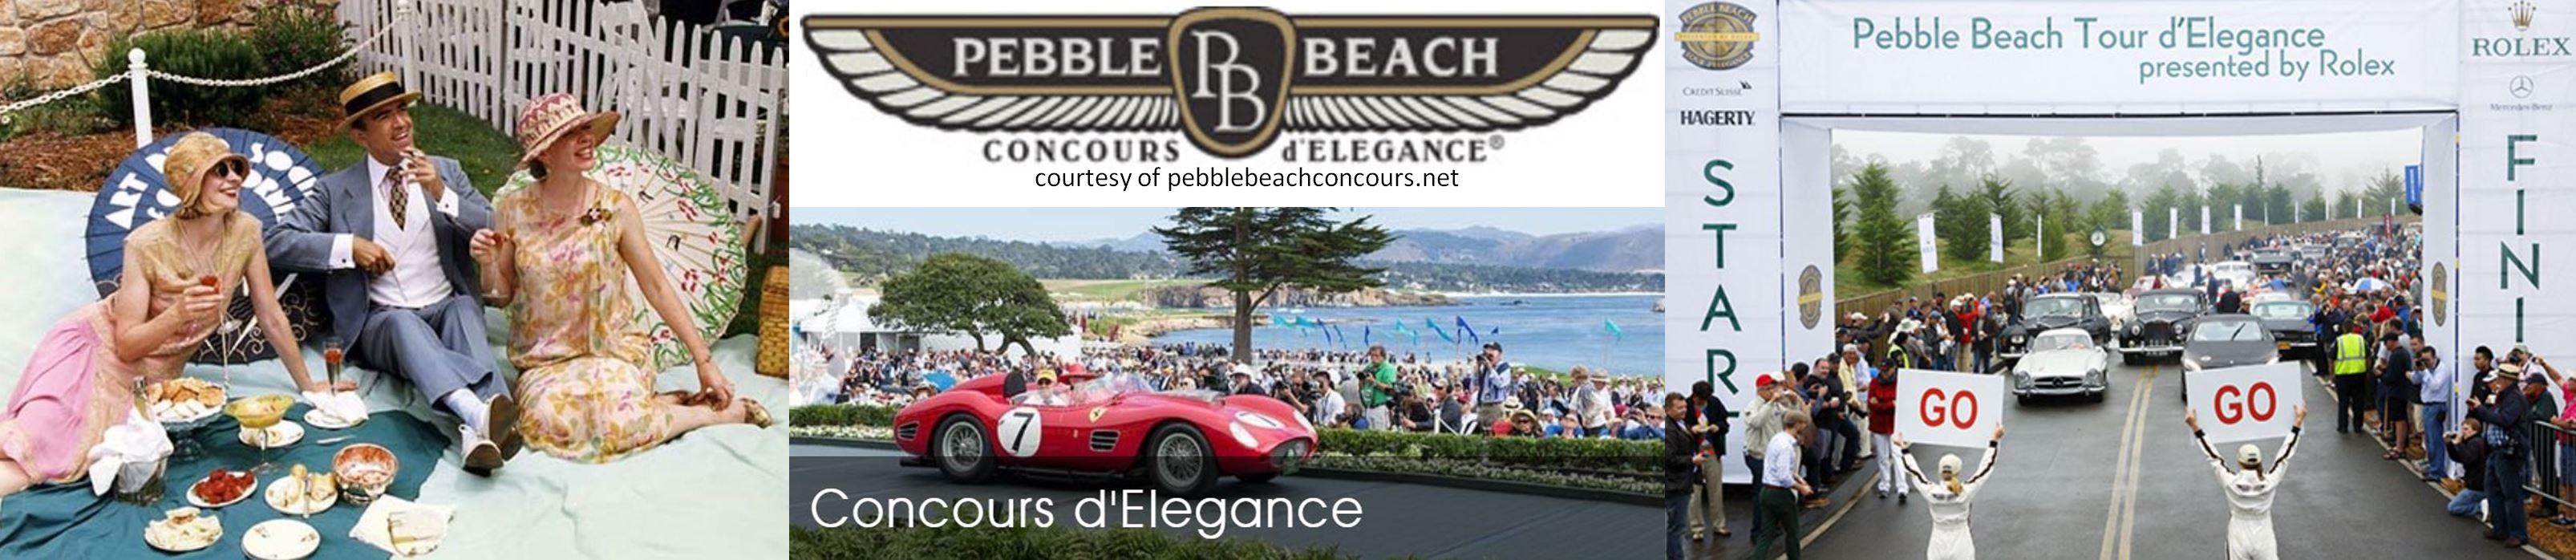 coastal-valley-dermatology-carmel-pebble-beach-concours-delegance-photo